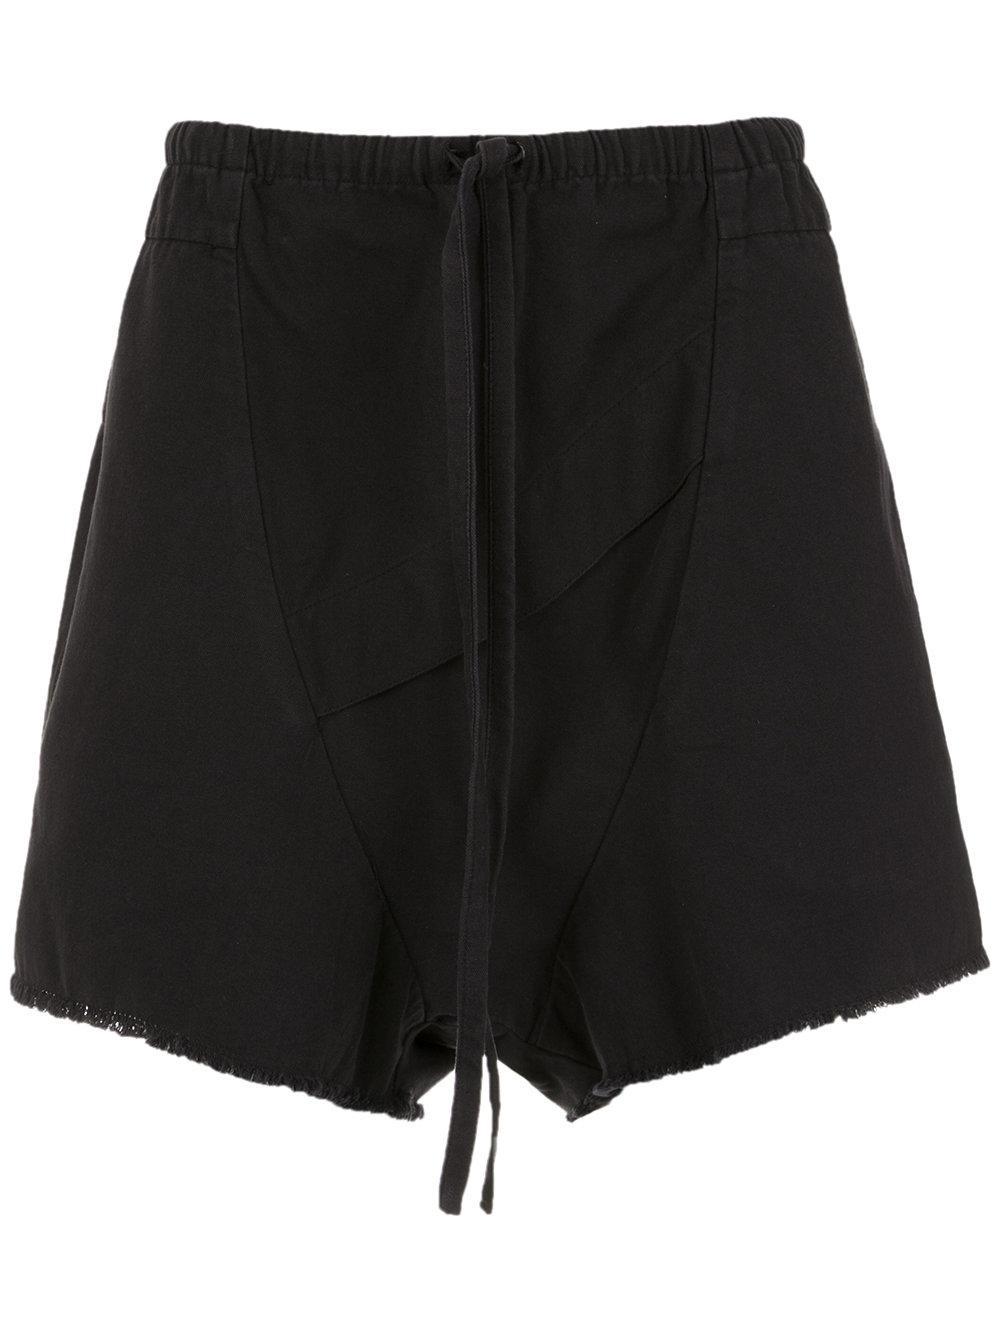 Osklen Over Drop Crotch Shorts - Black